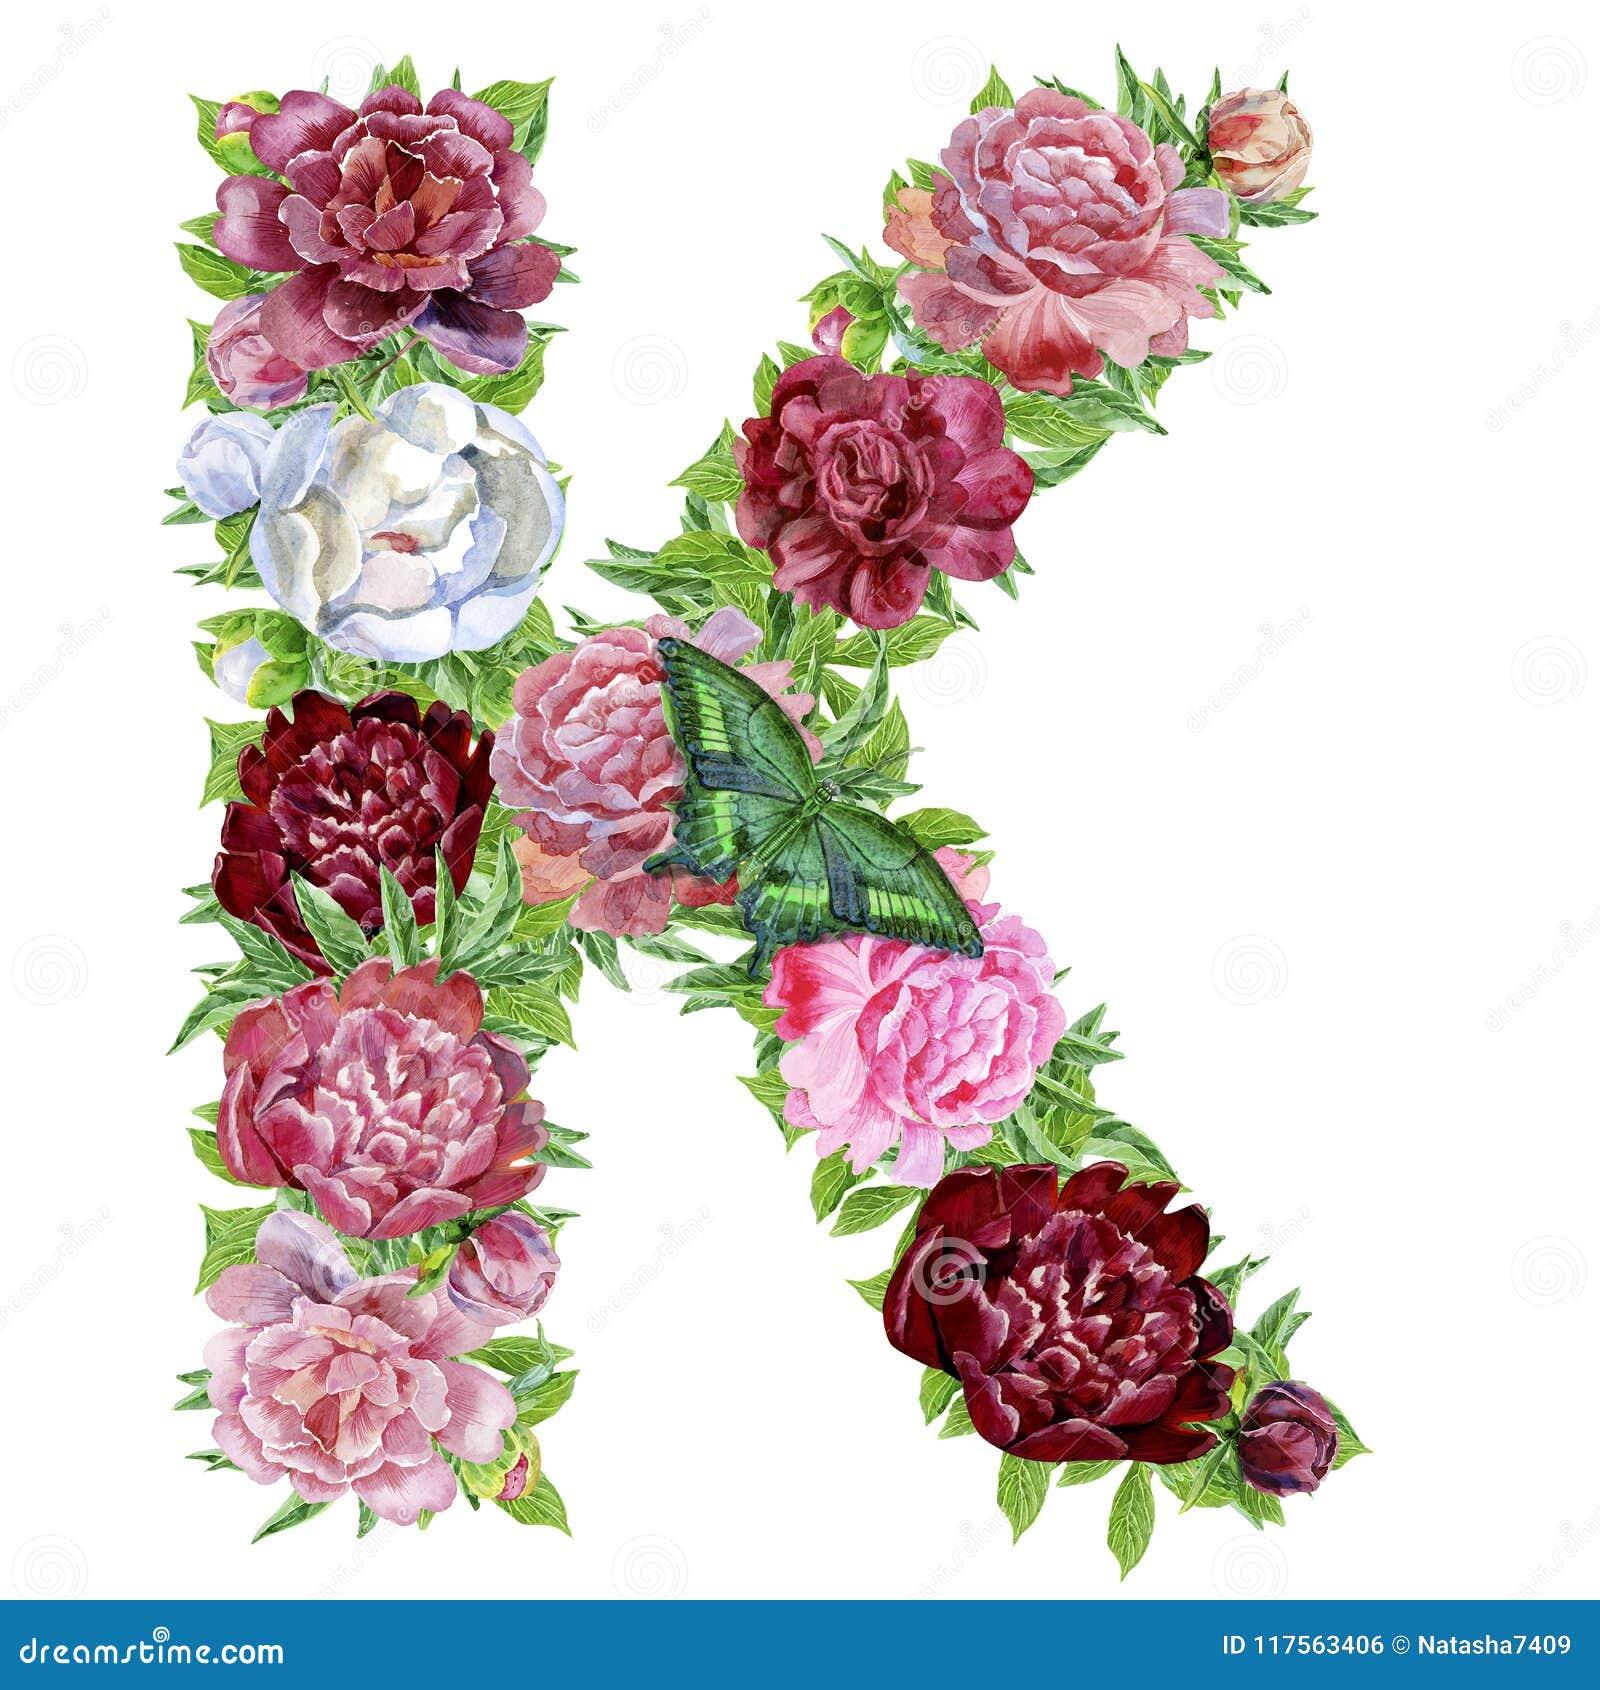 Letter K of watercolor flowers